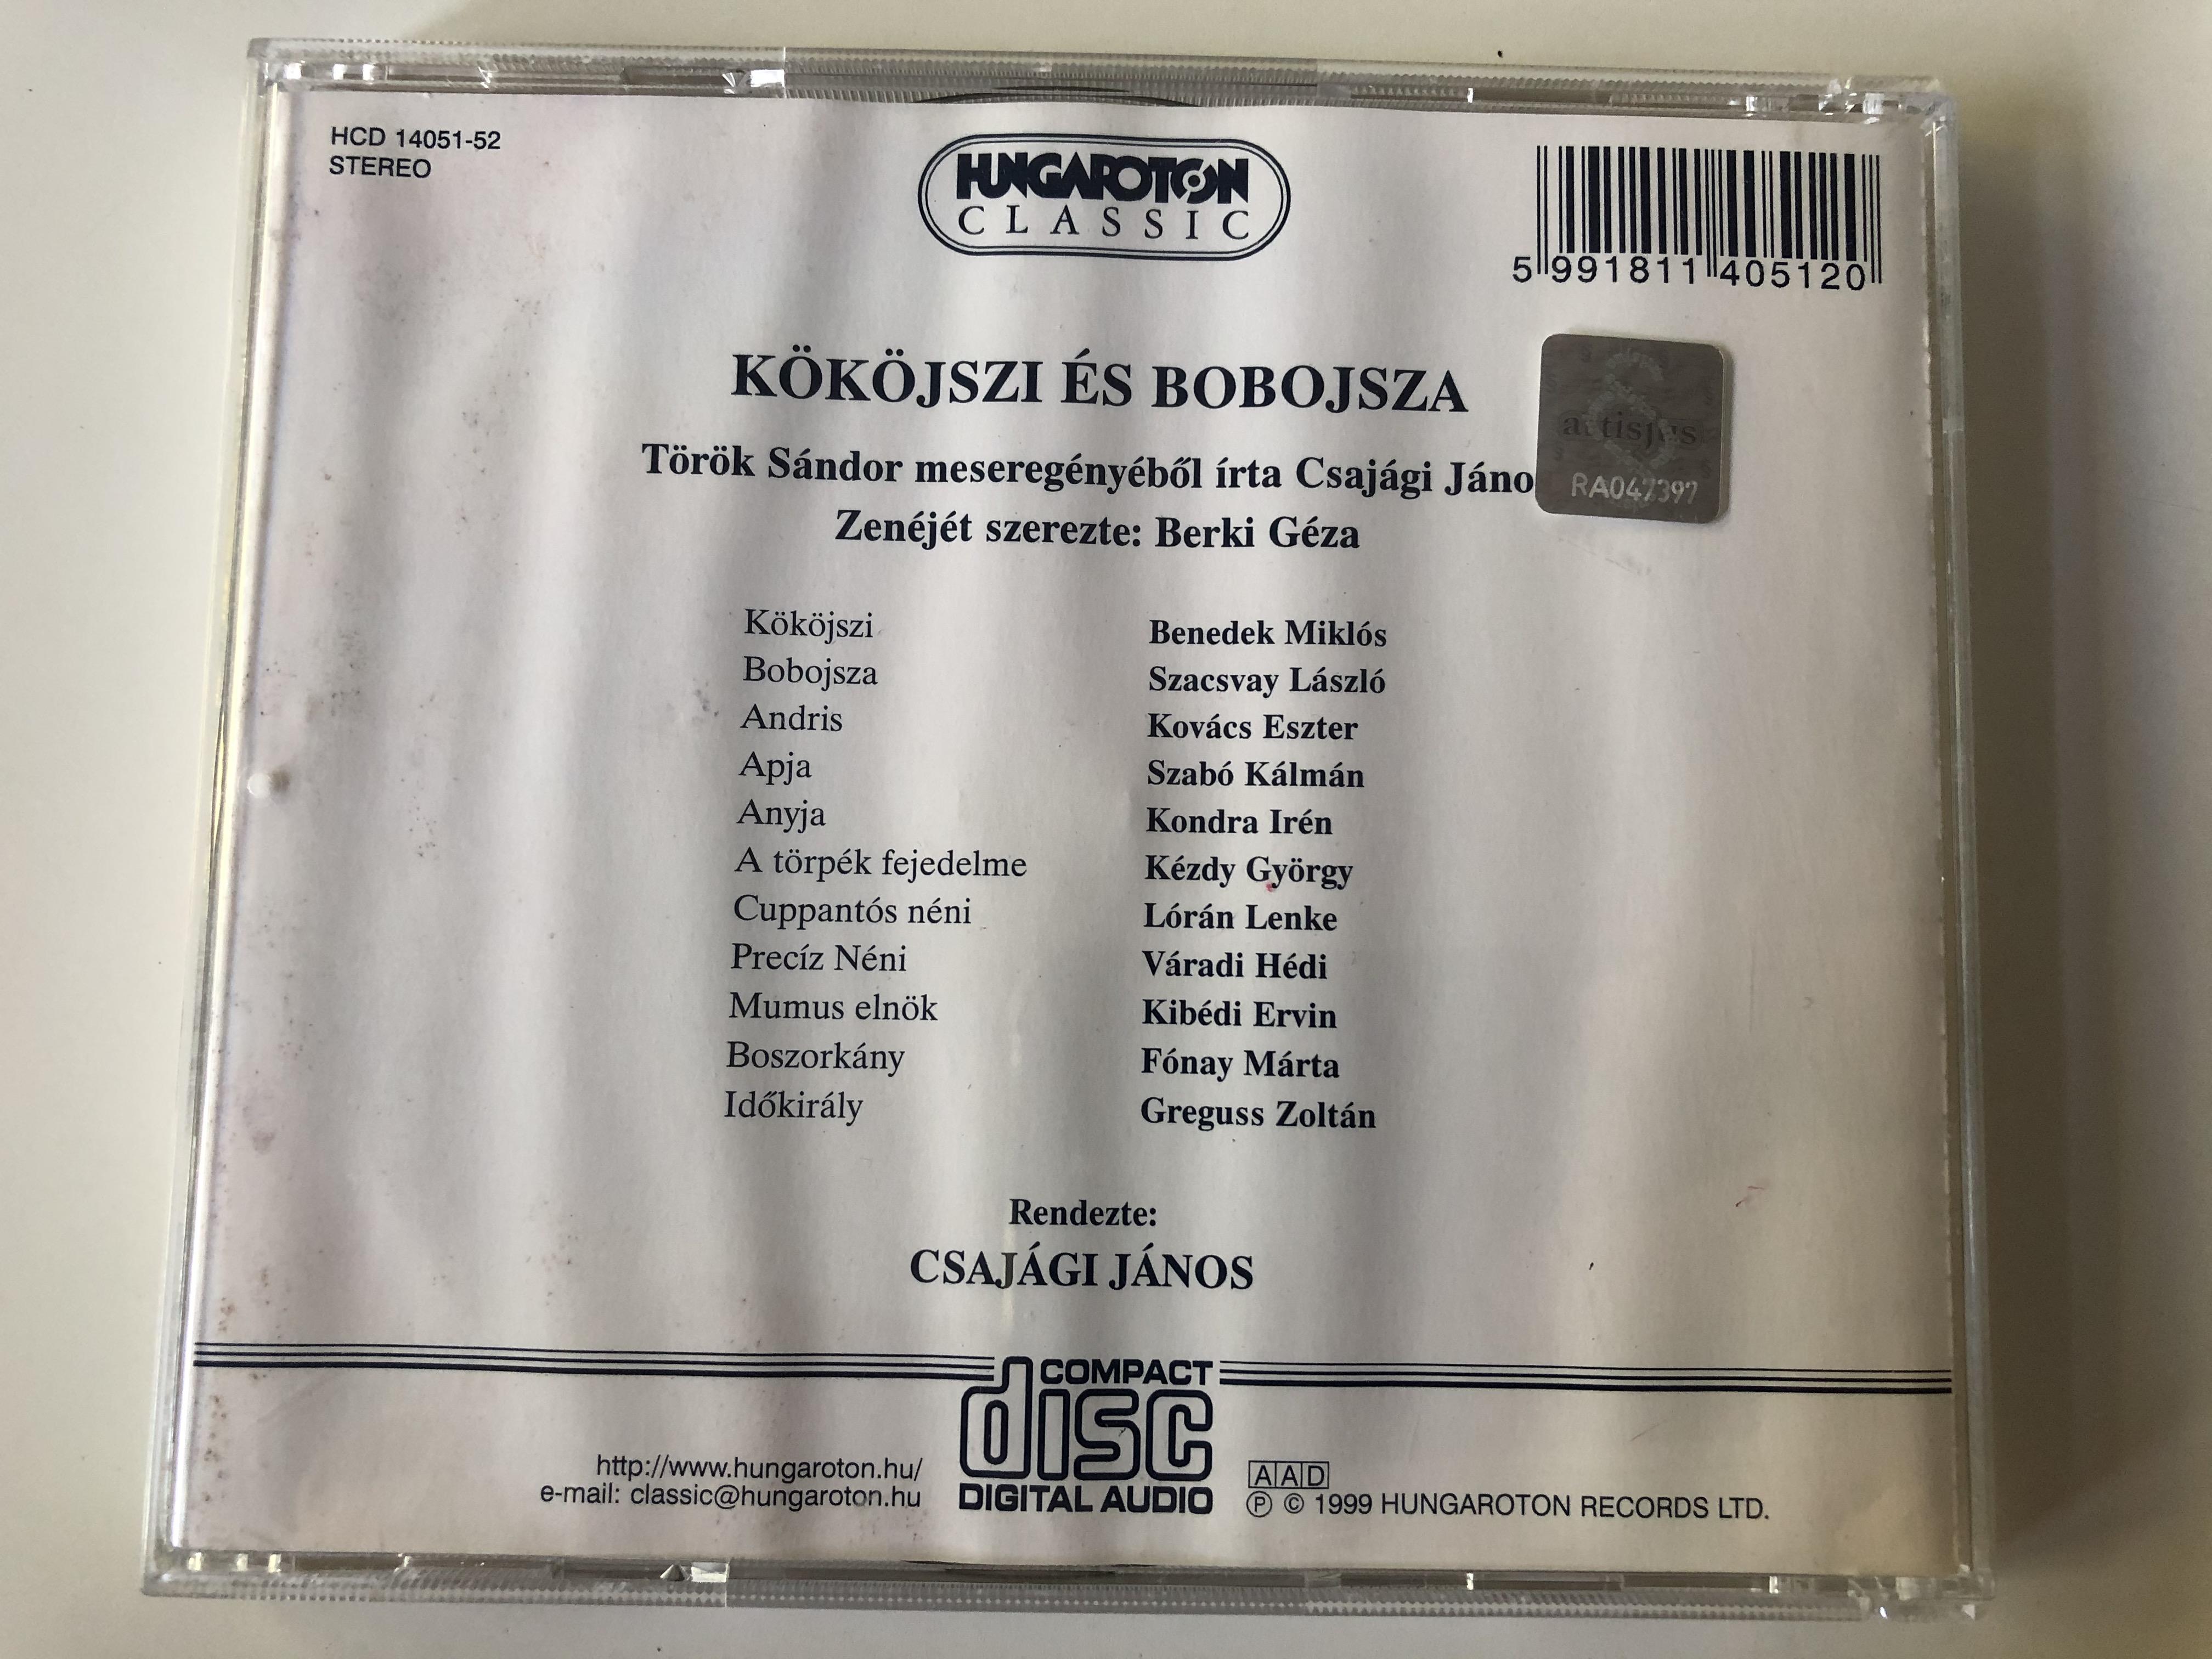 t-r-k-sandor-k-k-jszi-s-bobojsza-hungaroton-classic-2x-audio-cd-1999-stereo-hcd-14051-52-3-.jpg